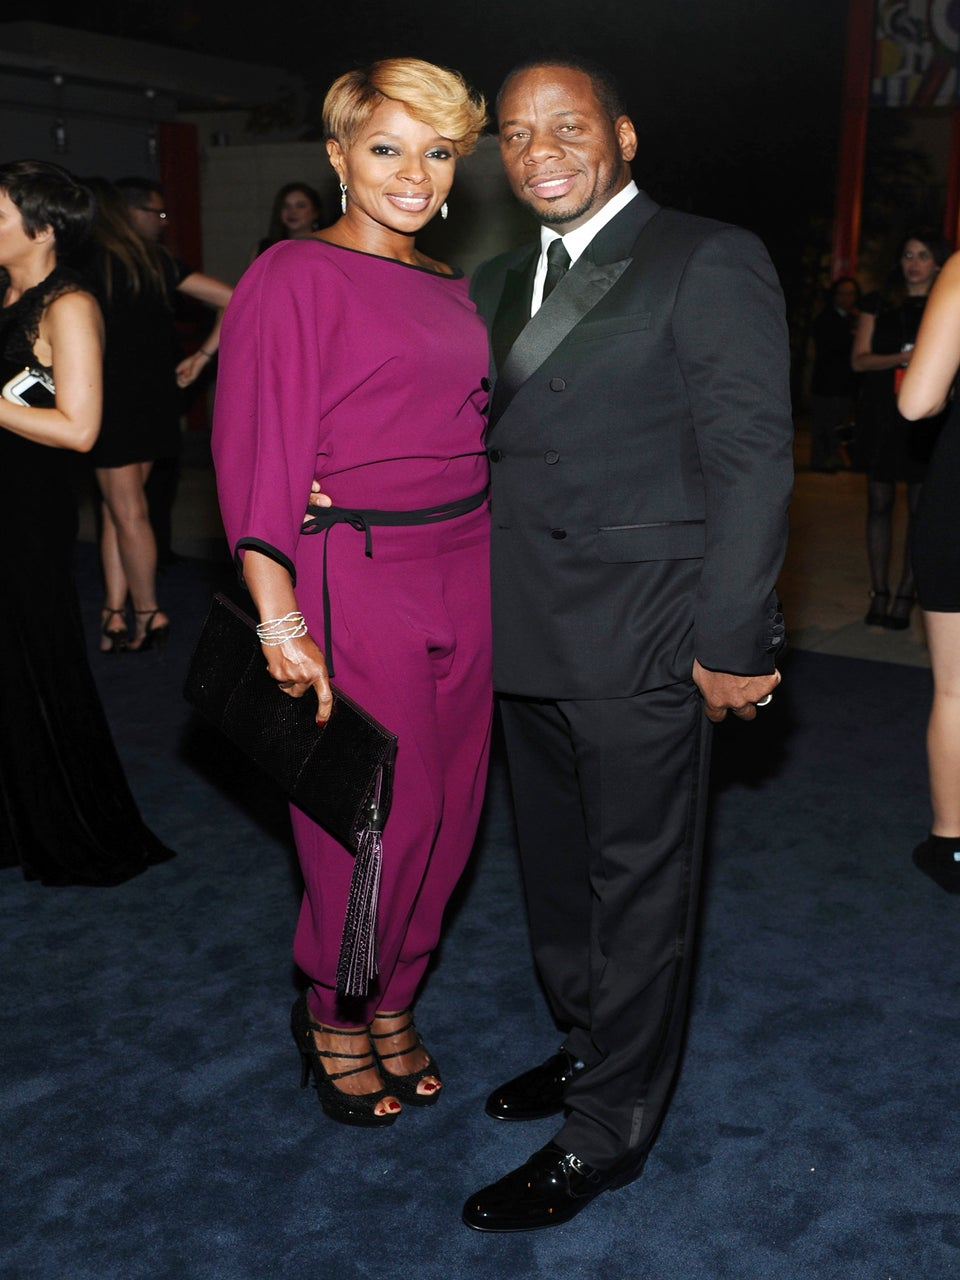 Mary J. Blige Says No Female Friends for Husband Kendu Isaacs